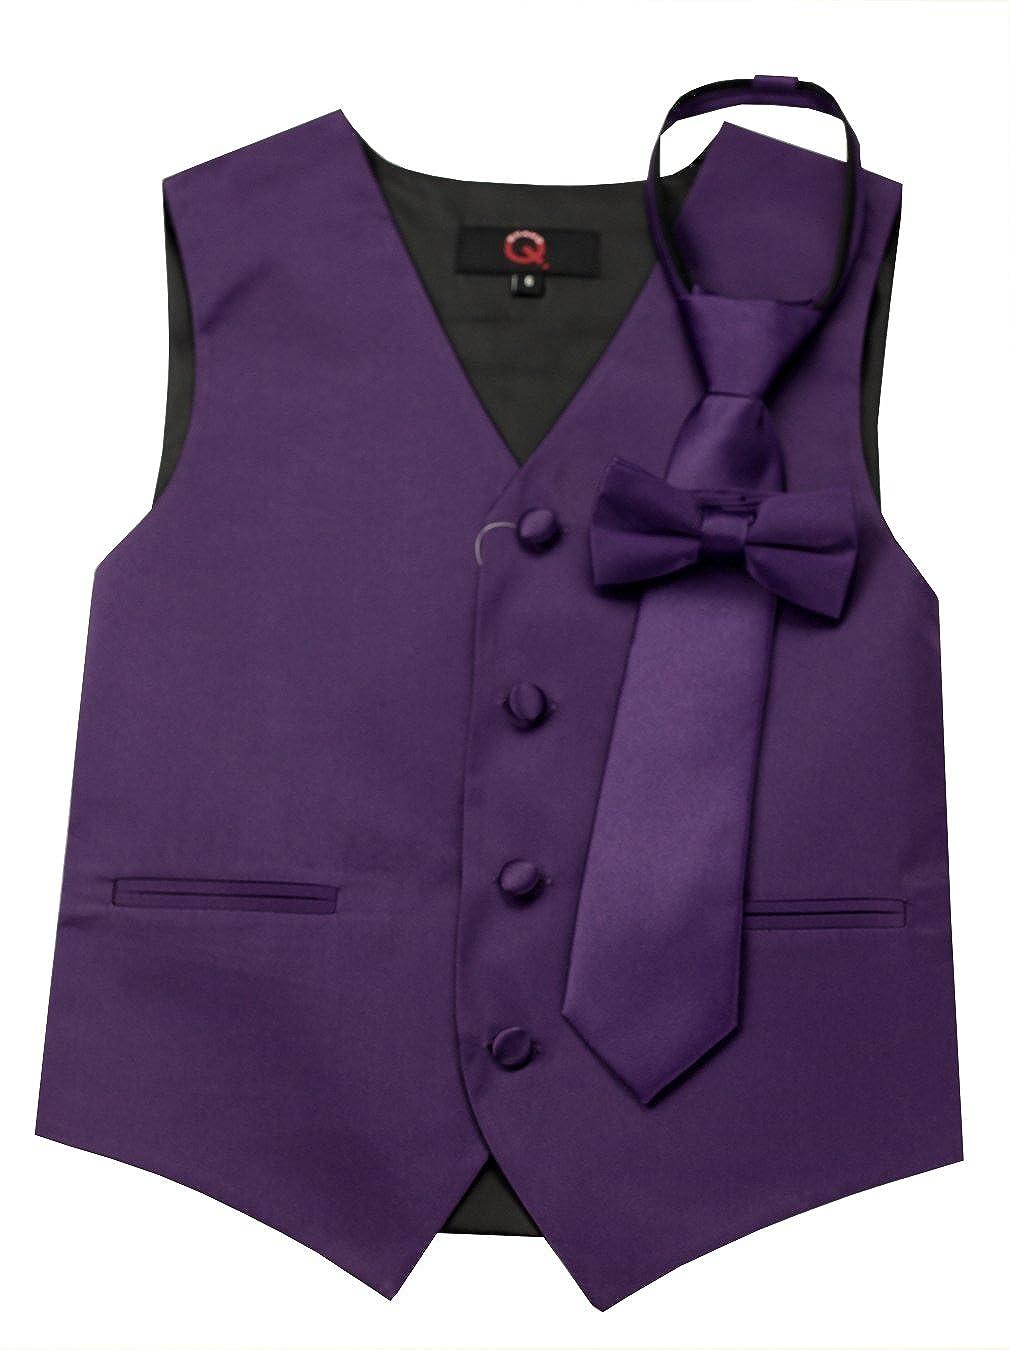 Brand Q Boy's Tuxedo Vest, Zipper Tie & Bow-Tie Set in Lapis Brand Q Boy's Tuxedo Vest B10BB